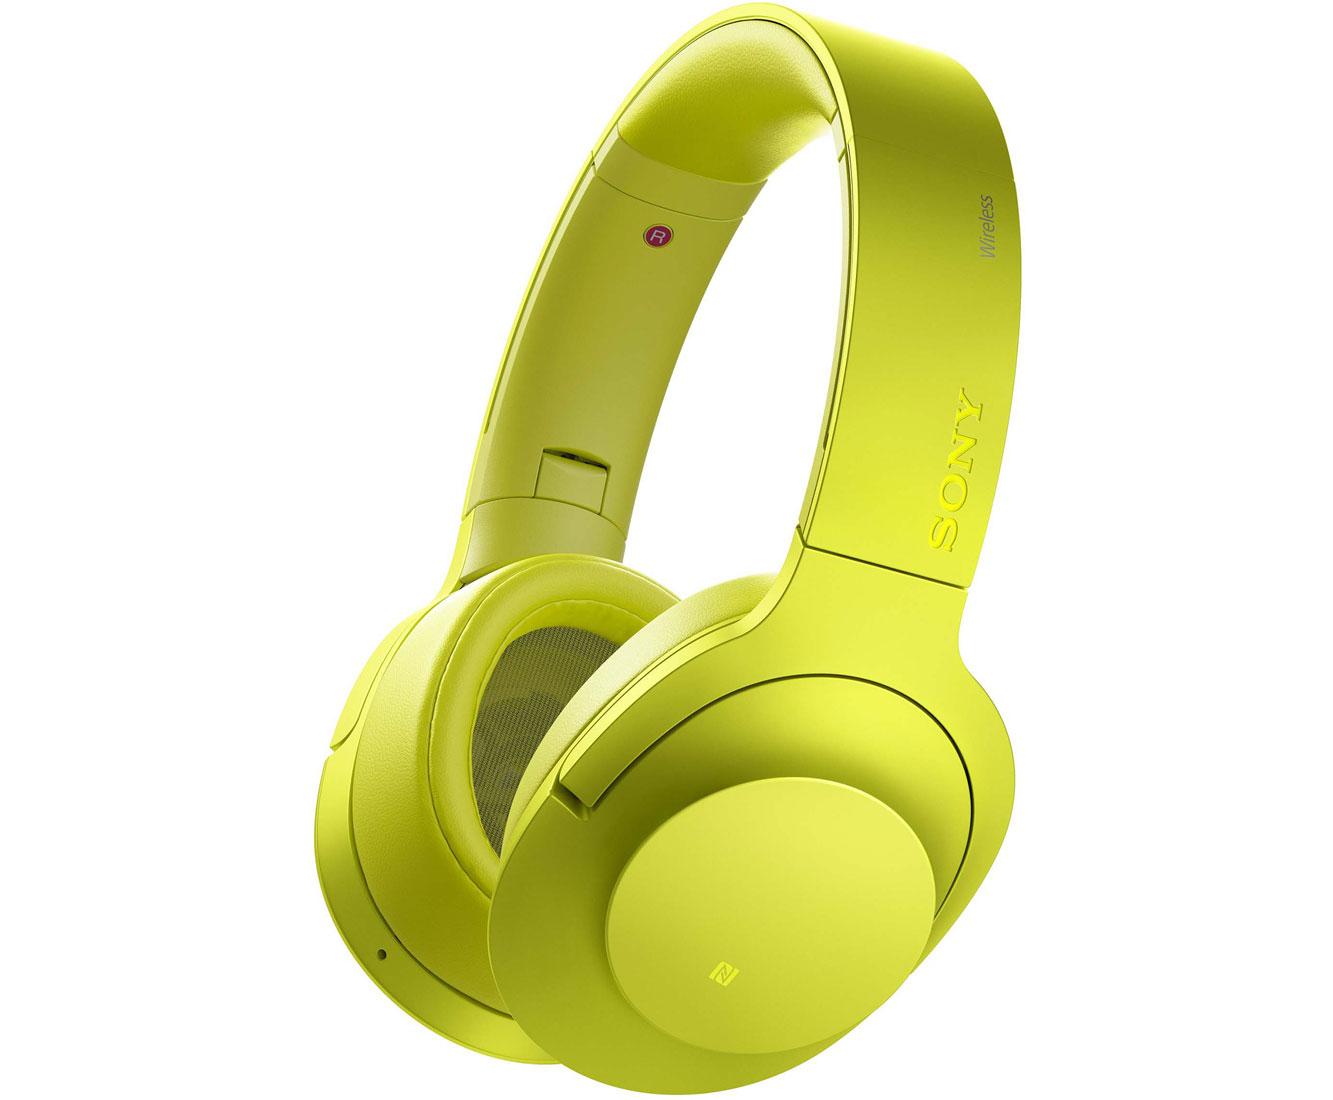 ANC-Kopfhörer Sony h.ear on Wireless NC MDR-100ABN gelb (Bluetooth inkl. LDAC, NFC, Over-Ear, Micro-USB, Klinke optional, faltbar)